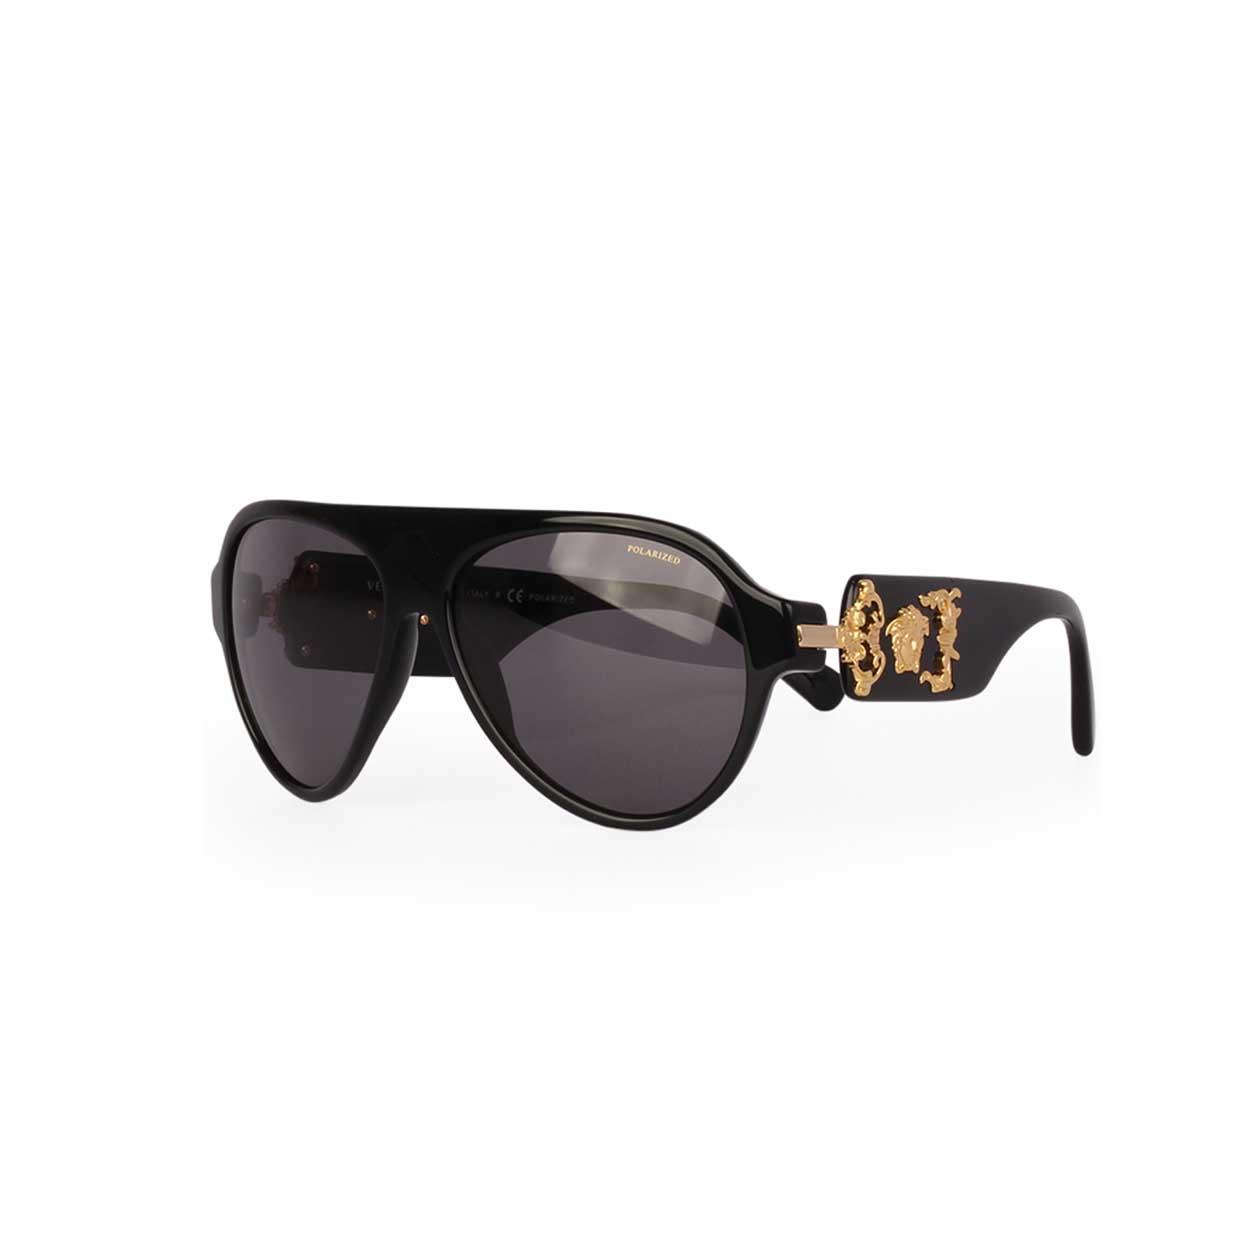 74034e437fc8 Versace Sunglasses Black Gold - Bitterroot Public Library